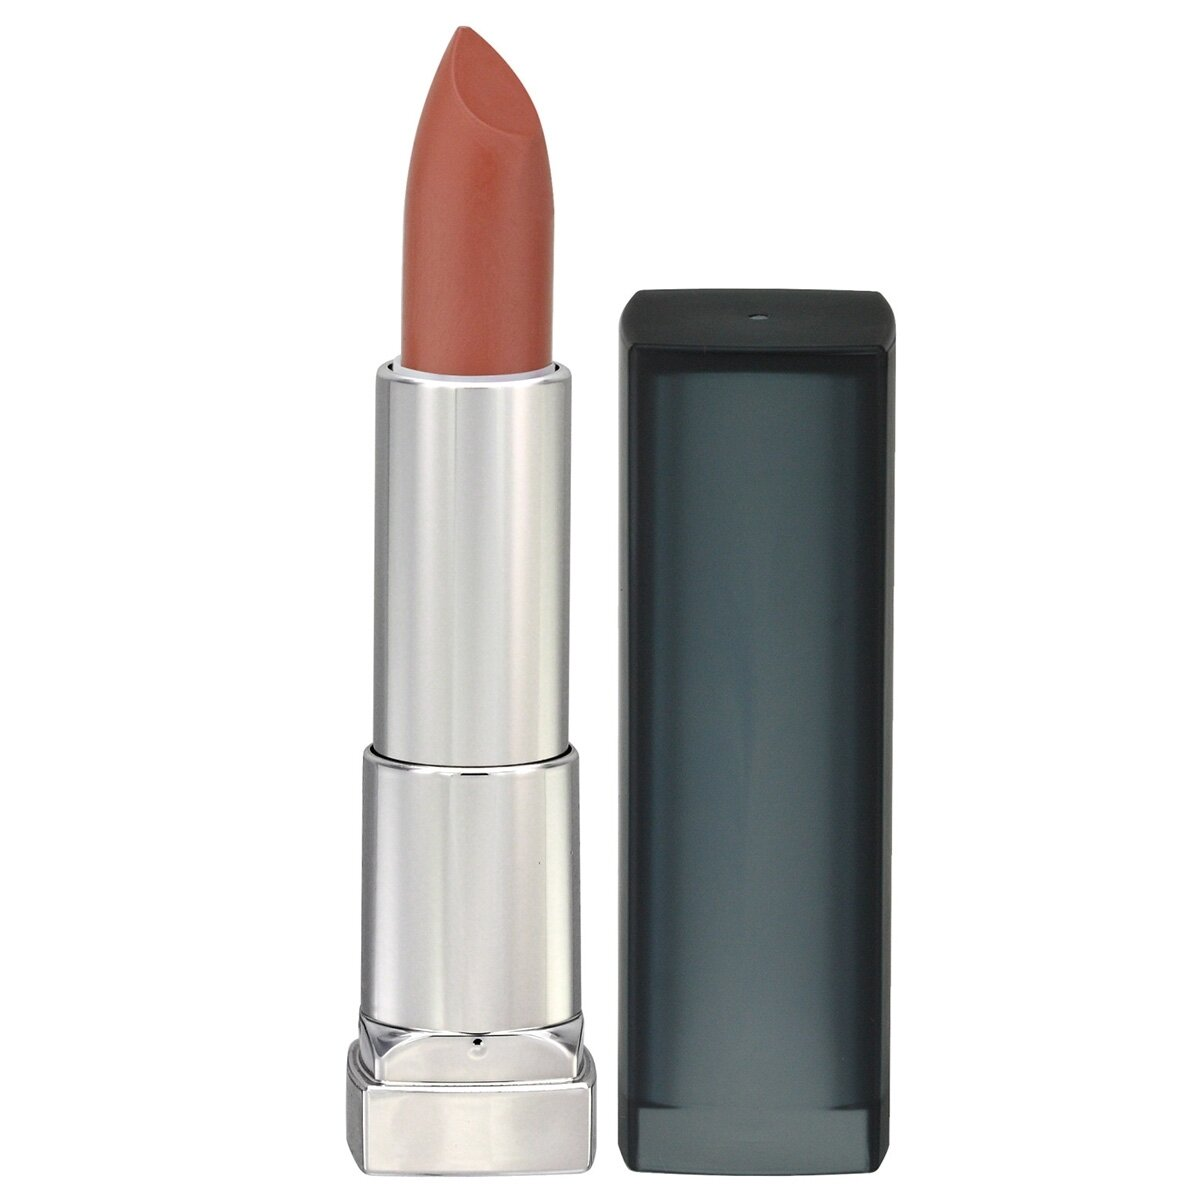 Color Sens Matte Nude Lipstick Ruj No. 932